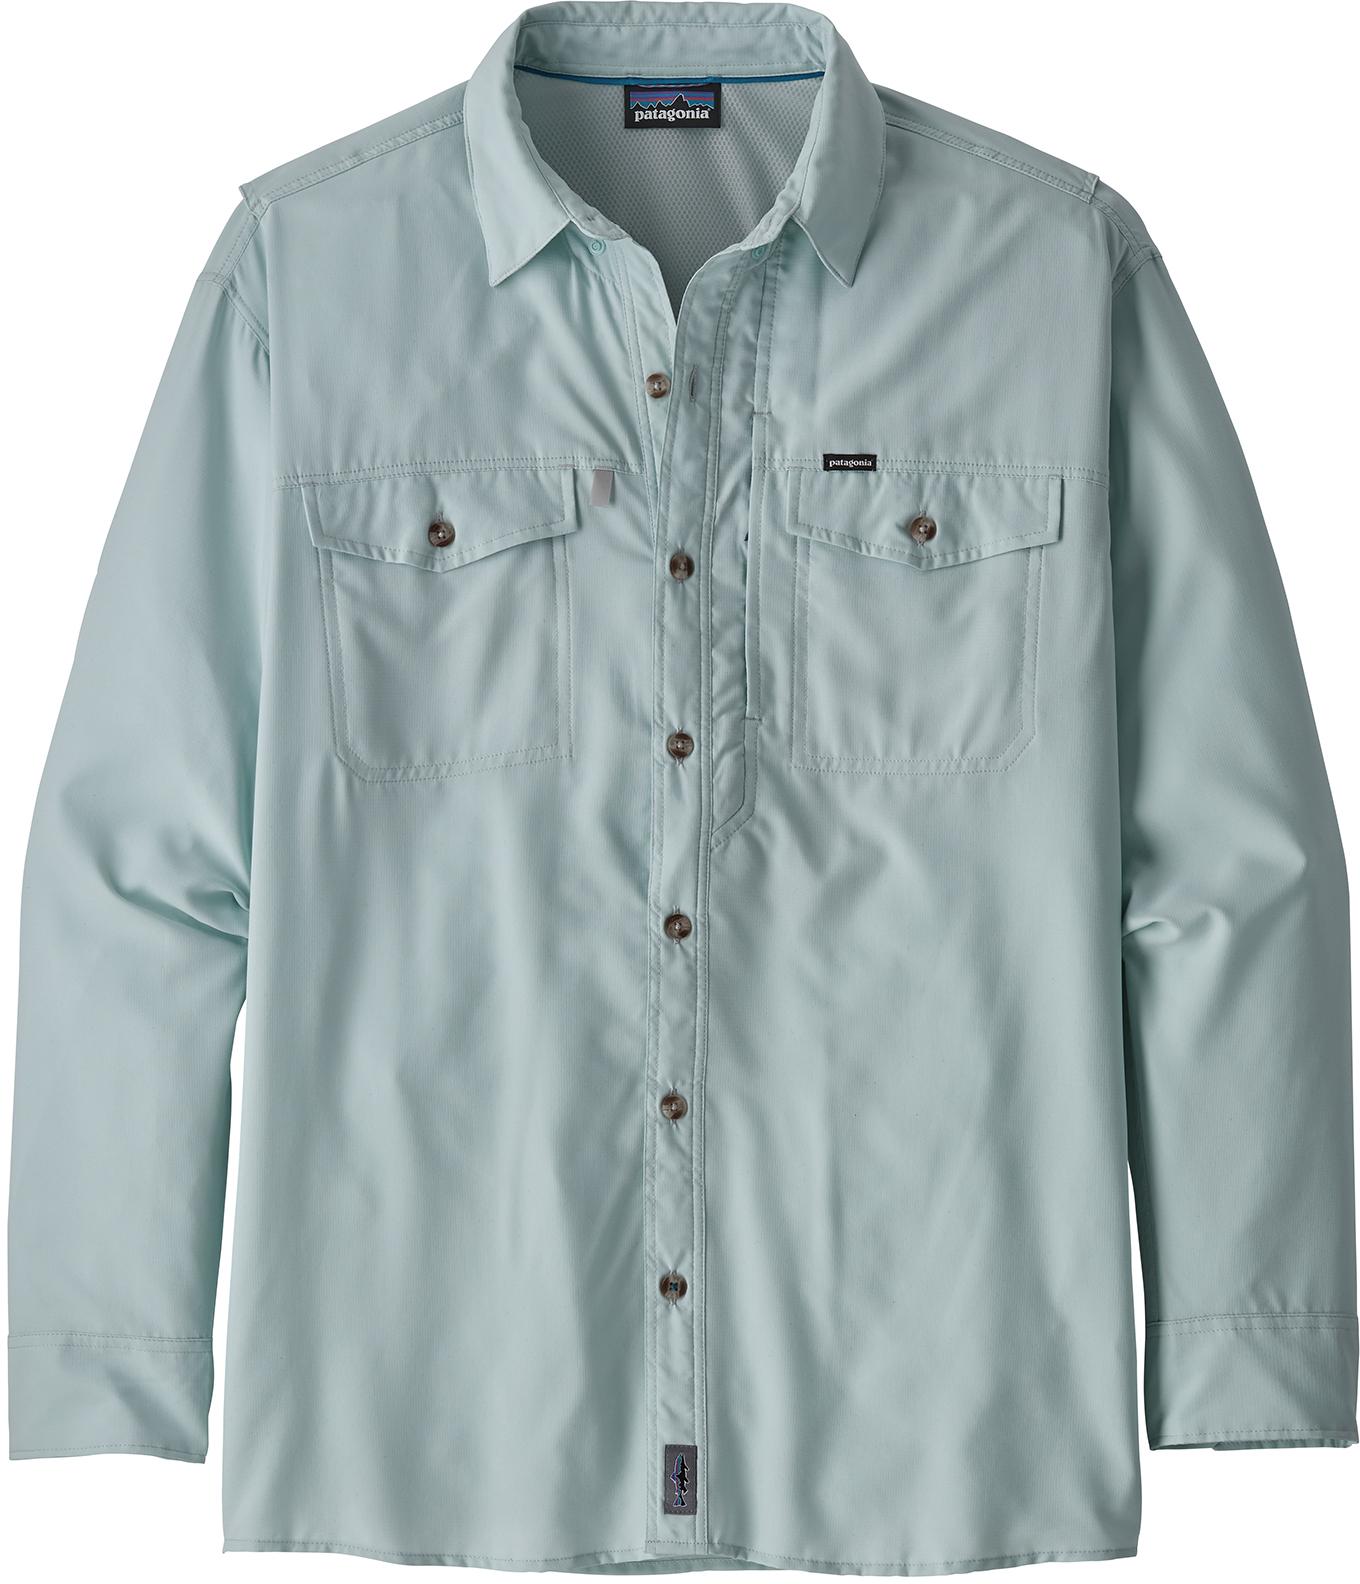 Patagonia Sol Patrol II Long Sleeve Shirt - Men s 5bd15d98c